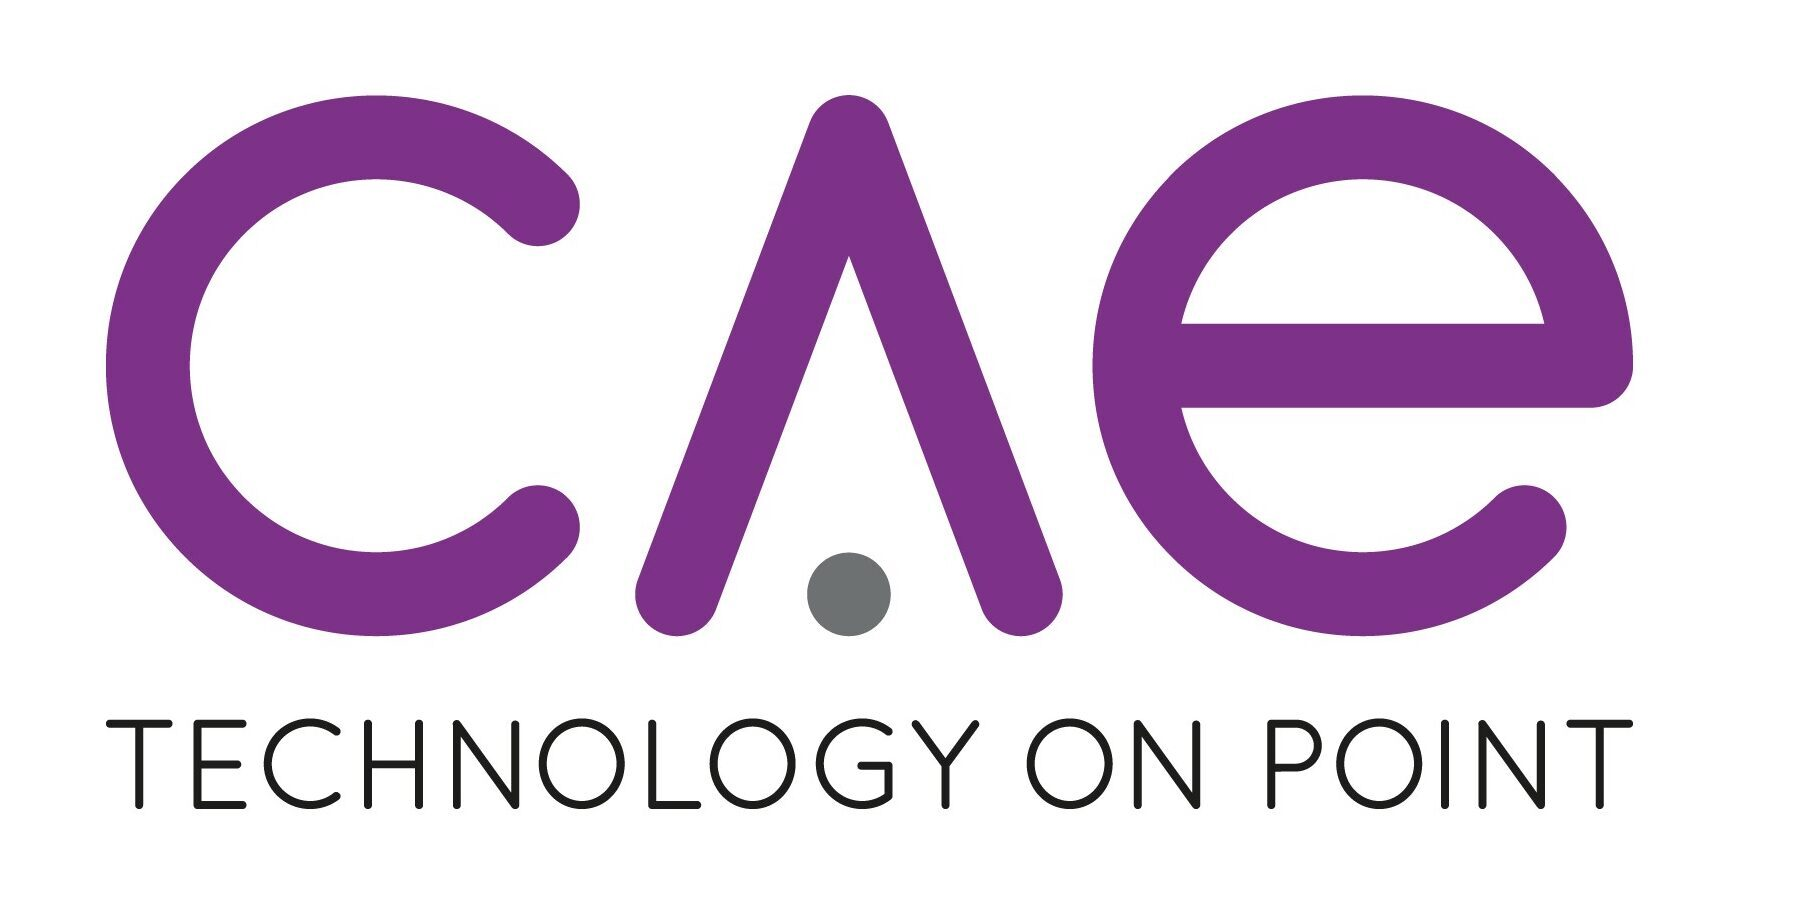 CAE Tech logo